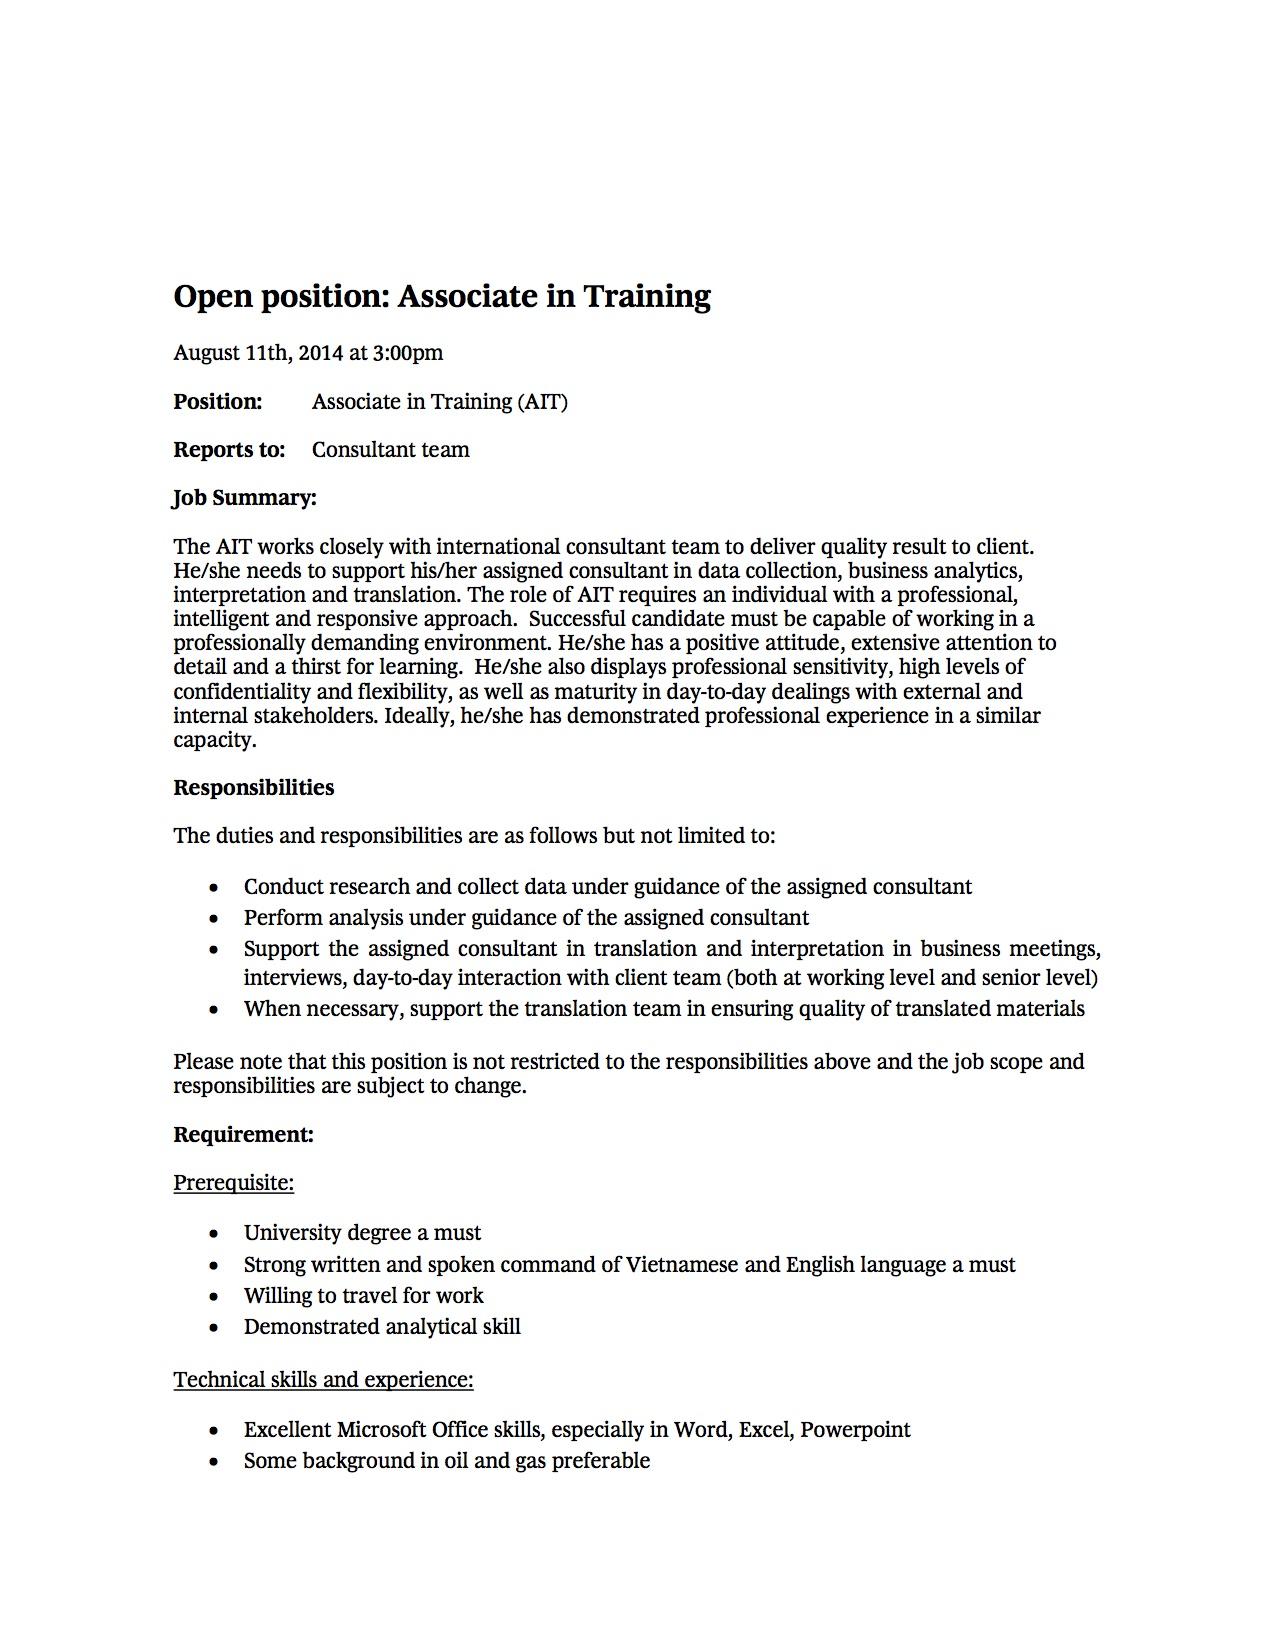 BCG - Associate in Training -11Aug2014